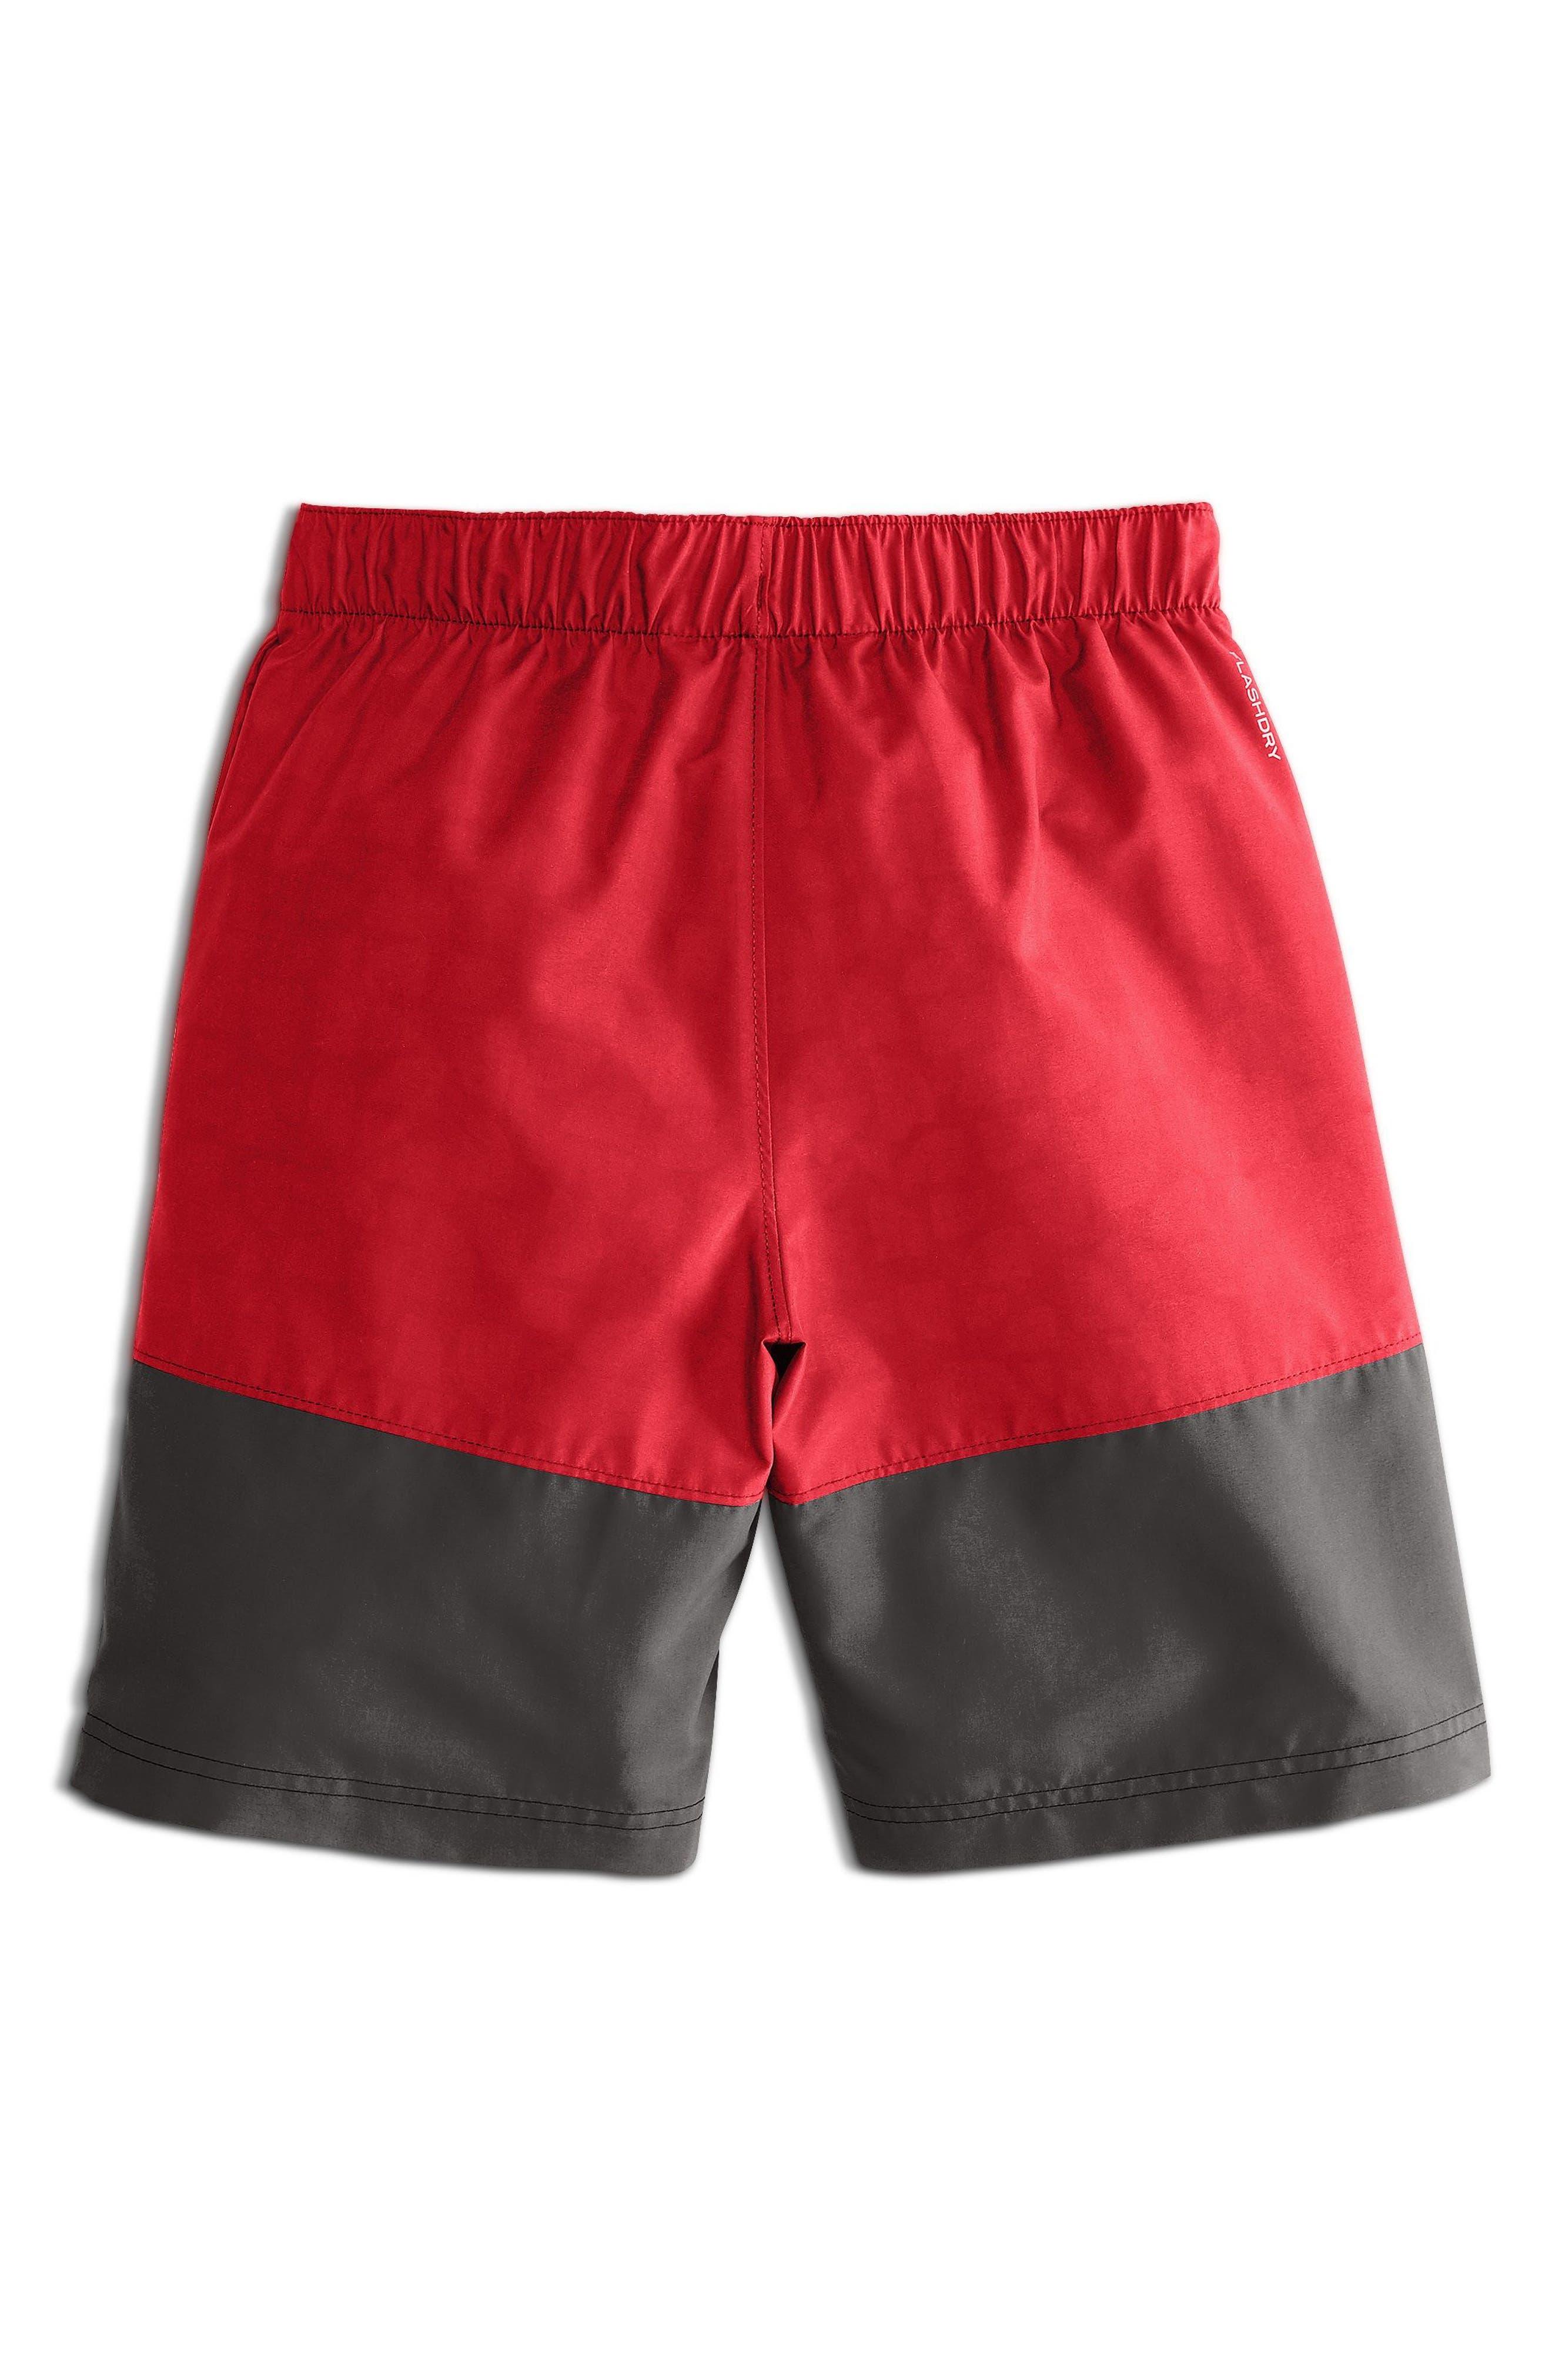 Swim Shorts,                             Alternate thumbnail 2, color,                             Tnf Red Logo Phantom Print